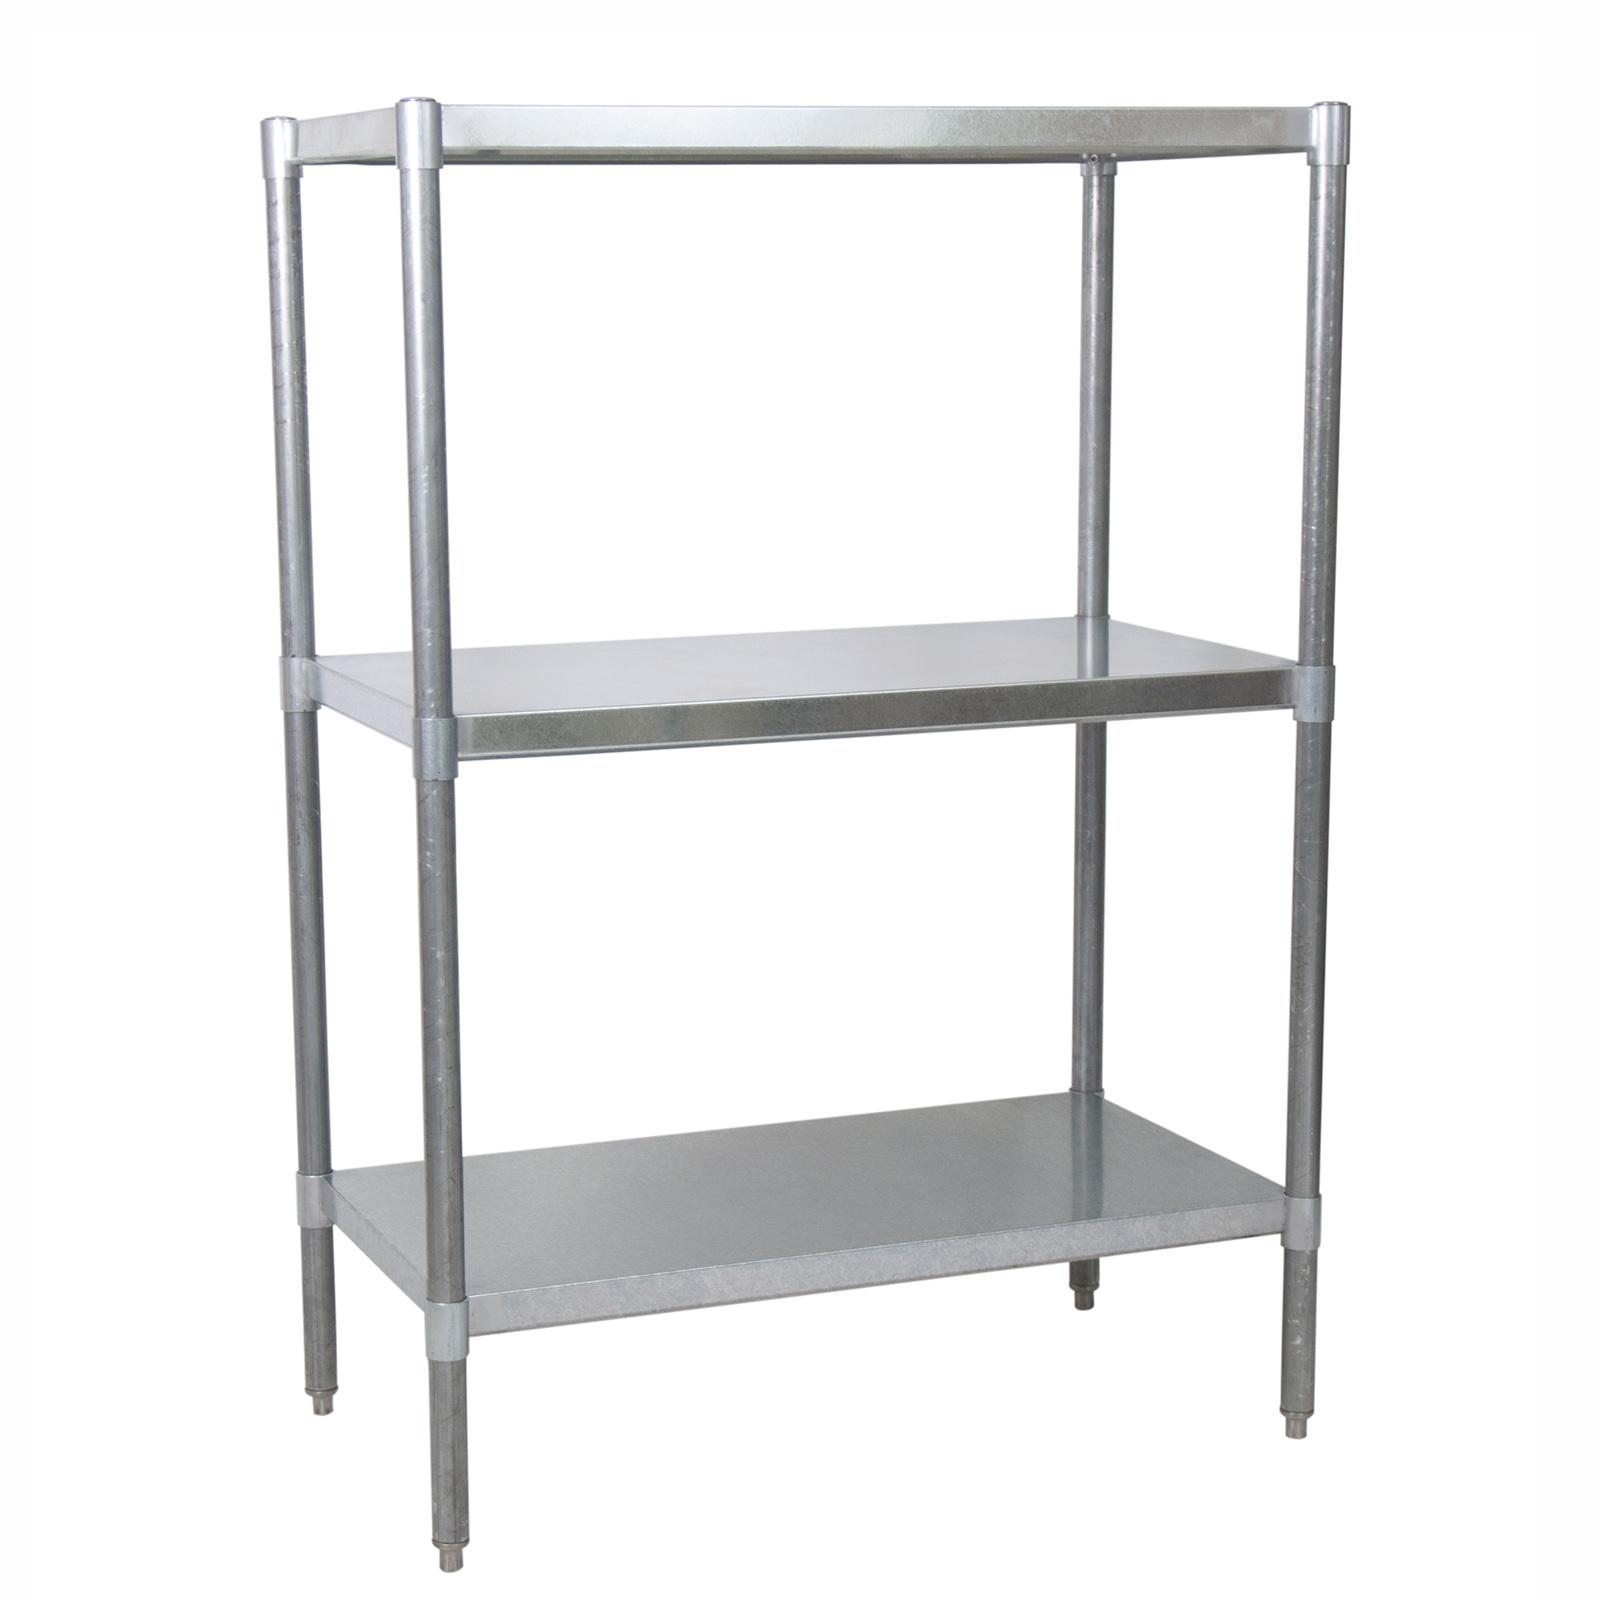 BK Resources VSU5-5524 shelving unit, solid flat